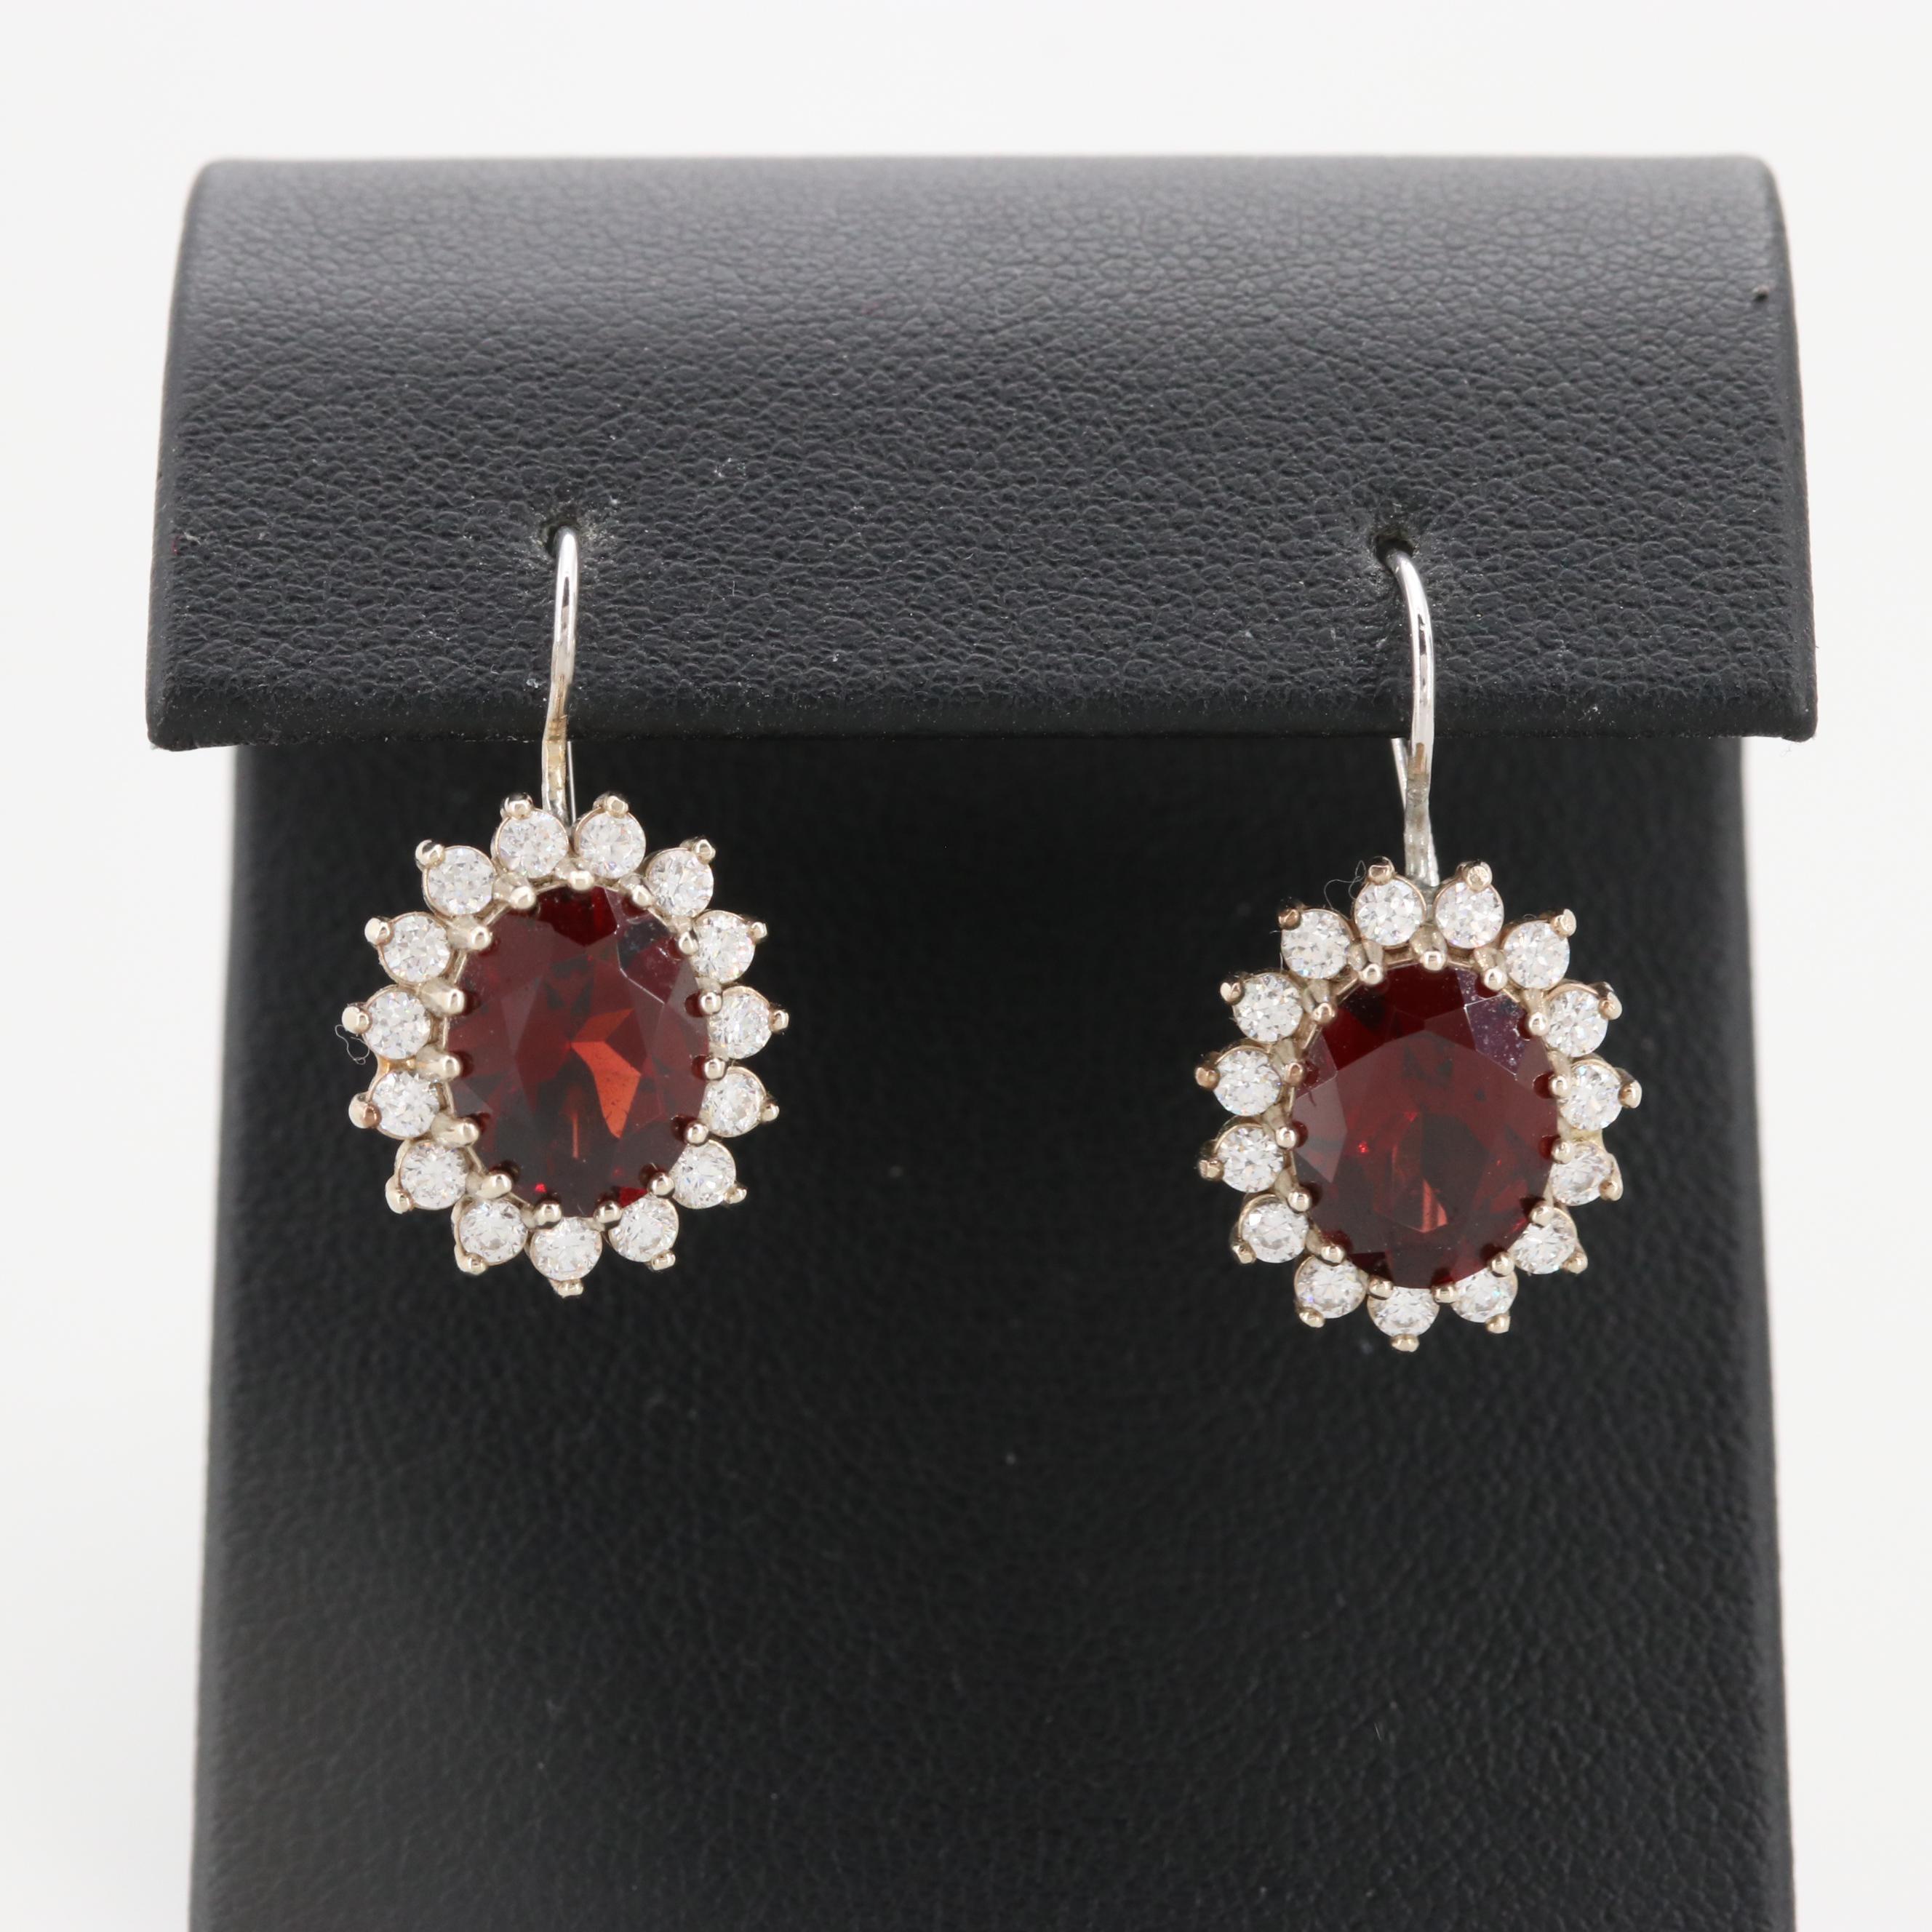 14K White Gold Garnet and Cubic Zirconia Drop Earrings